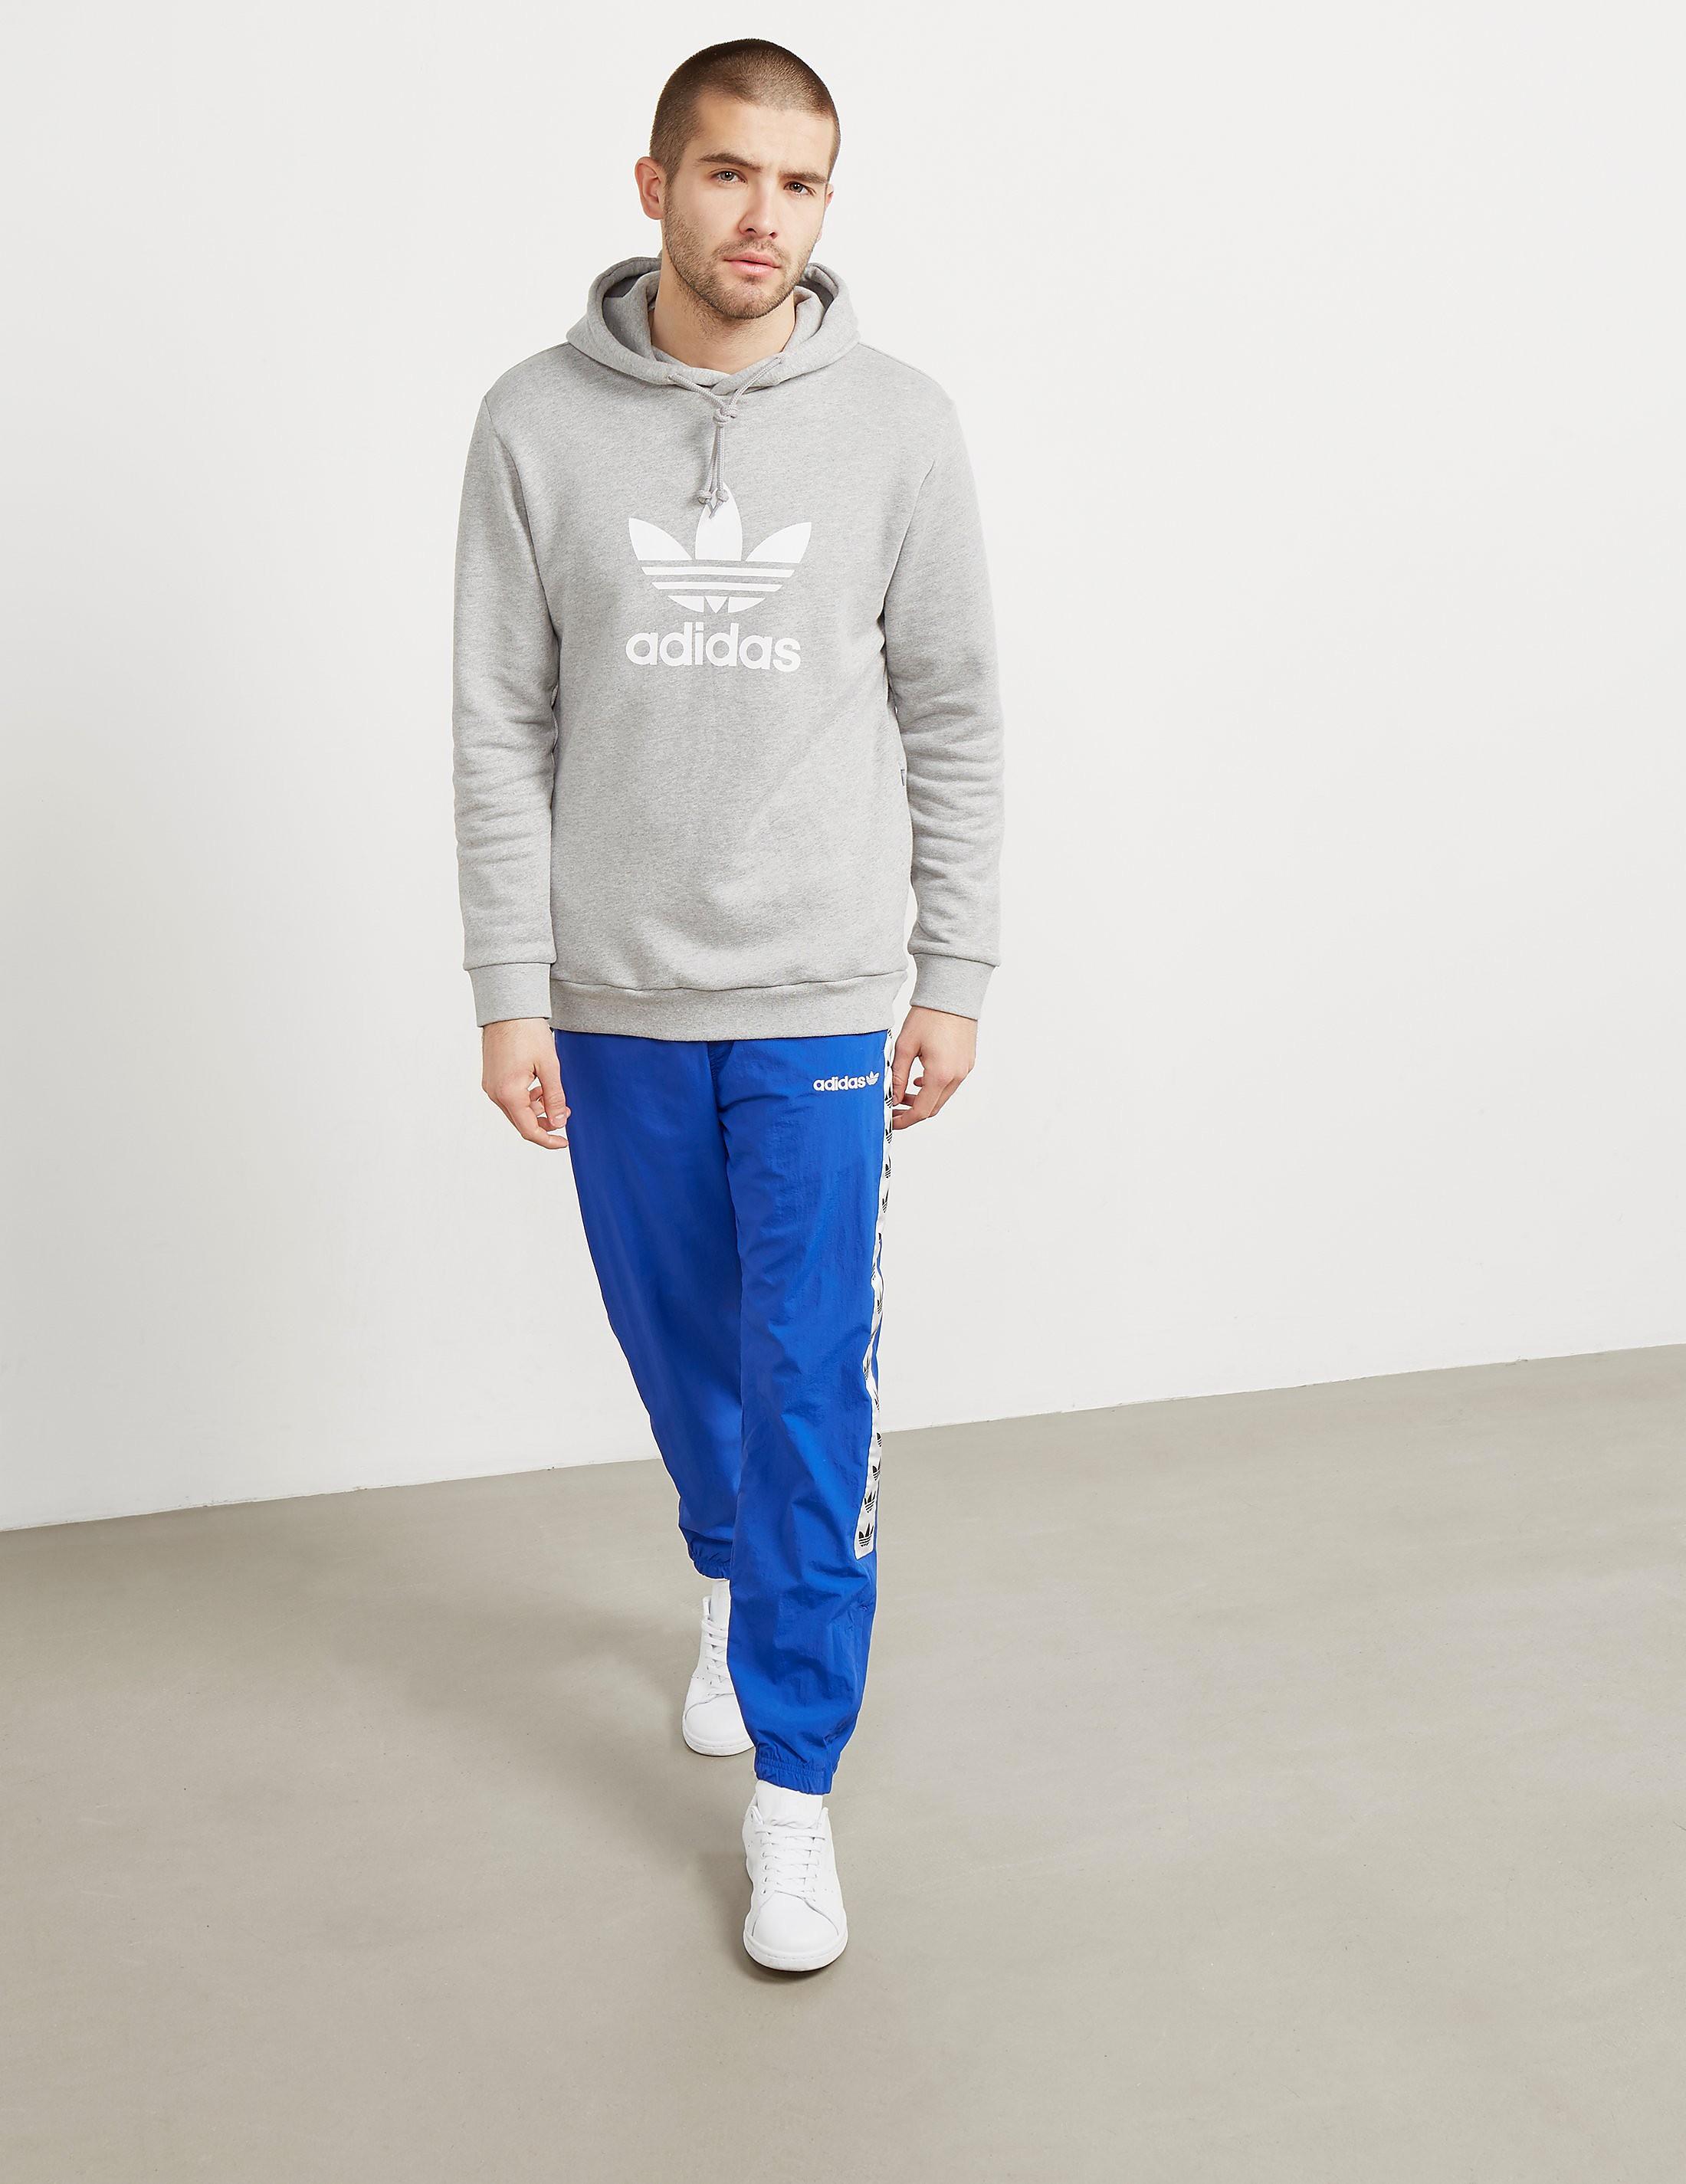 adidas Originals Trefoil State Overhead Hoodie